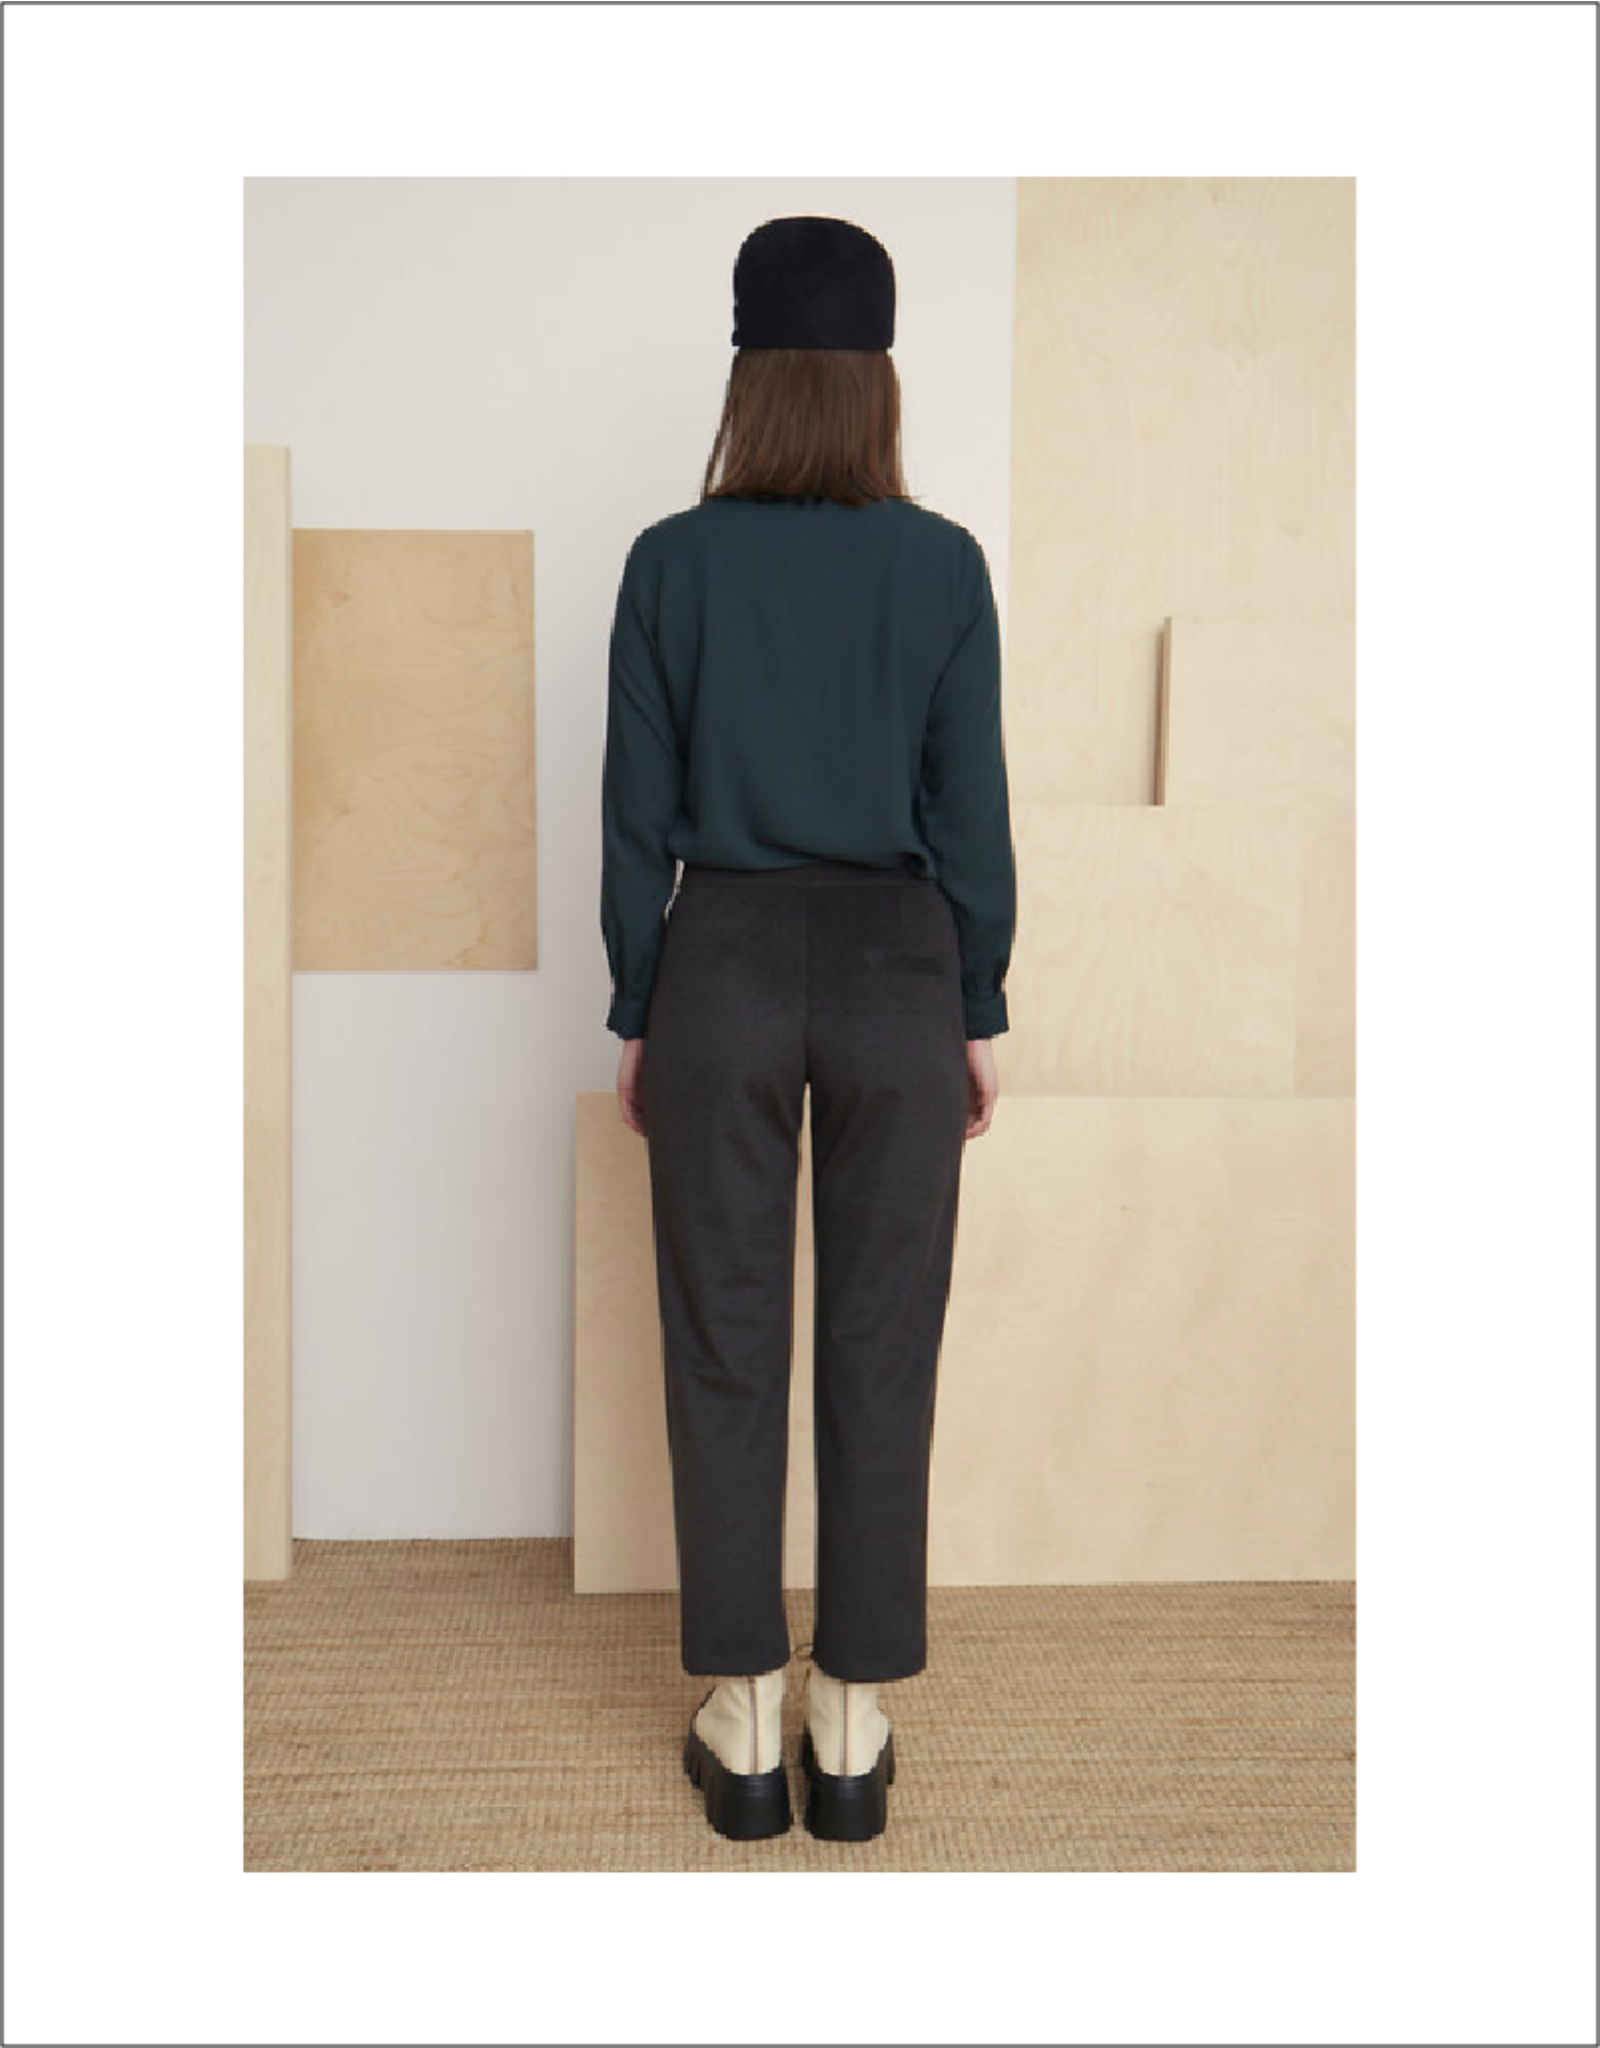 Bodybag High-Rise Slim Pant